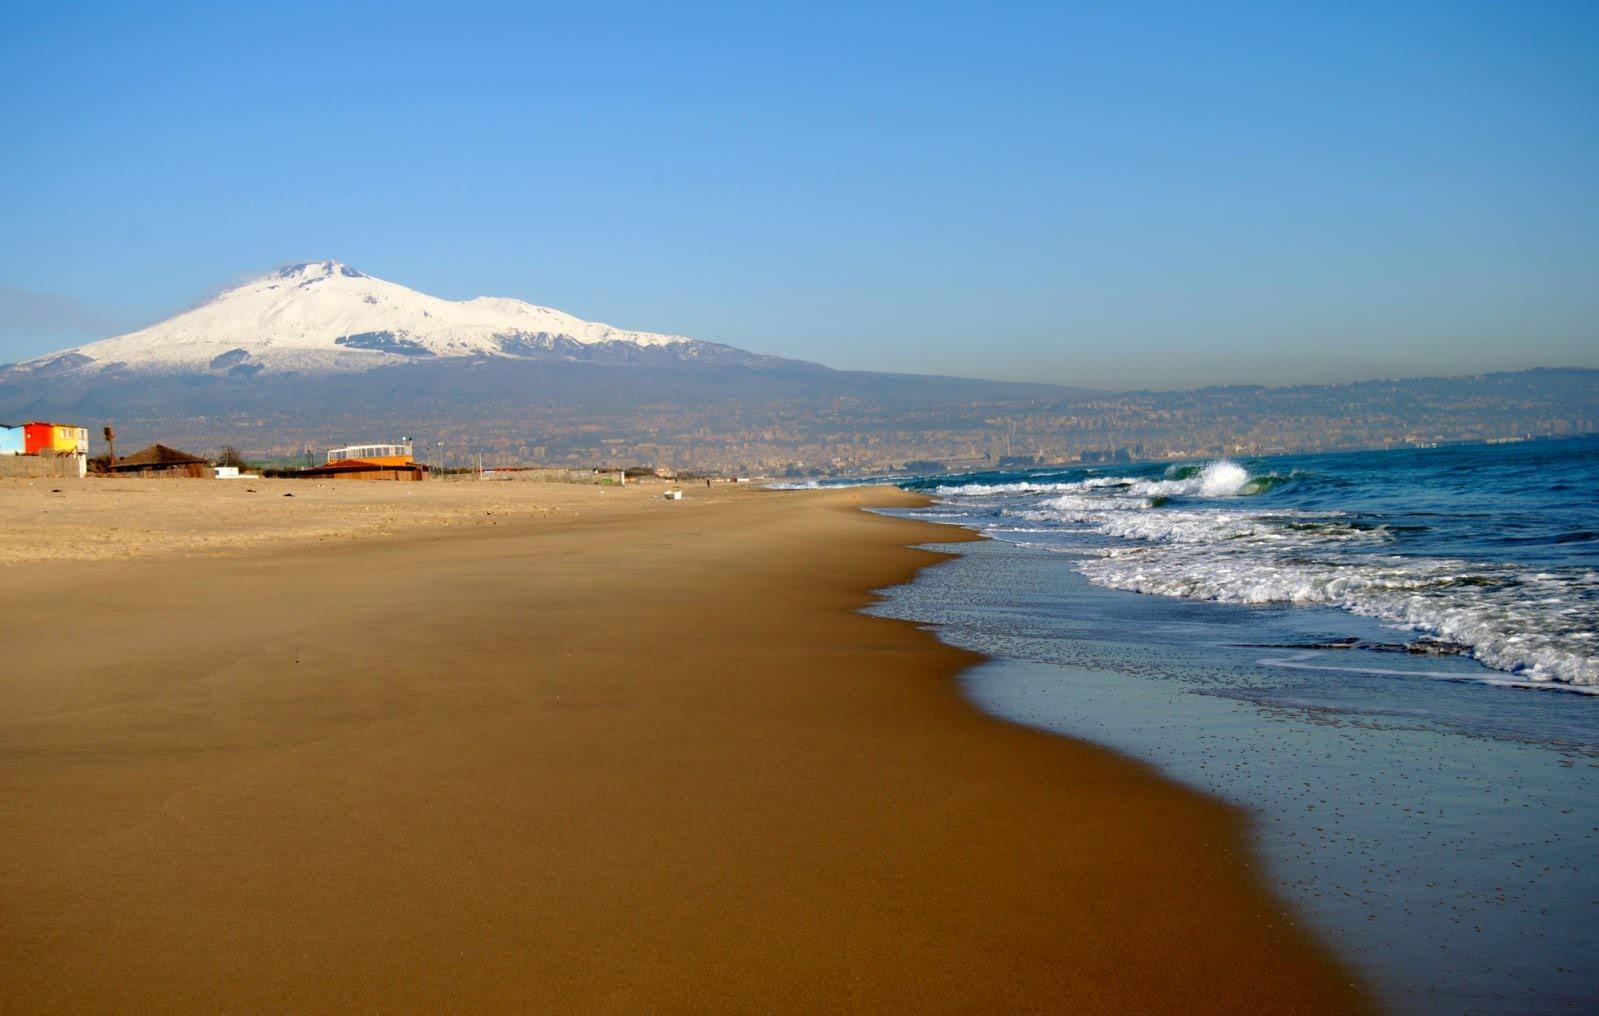 Week end al mare a catania le 5 spiagge pi belle in - Immagini di spongebob e sabbia ...